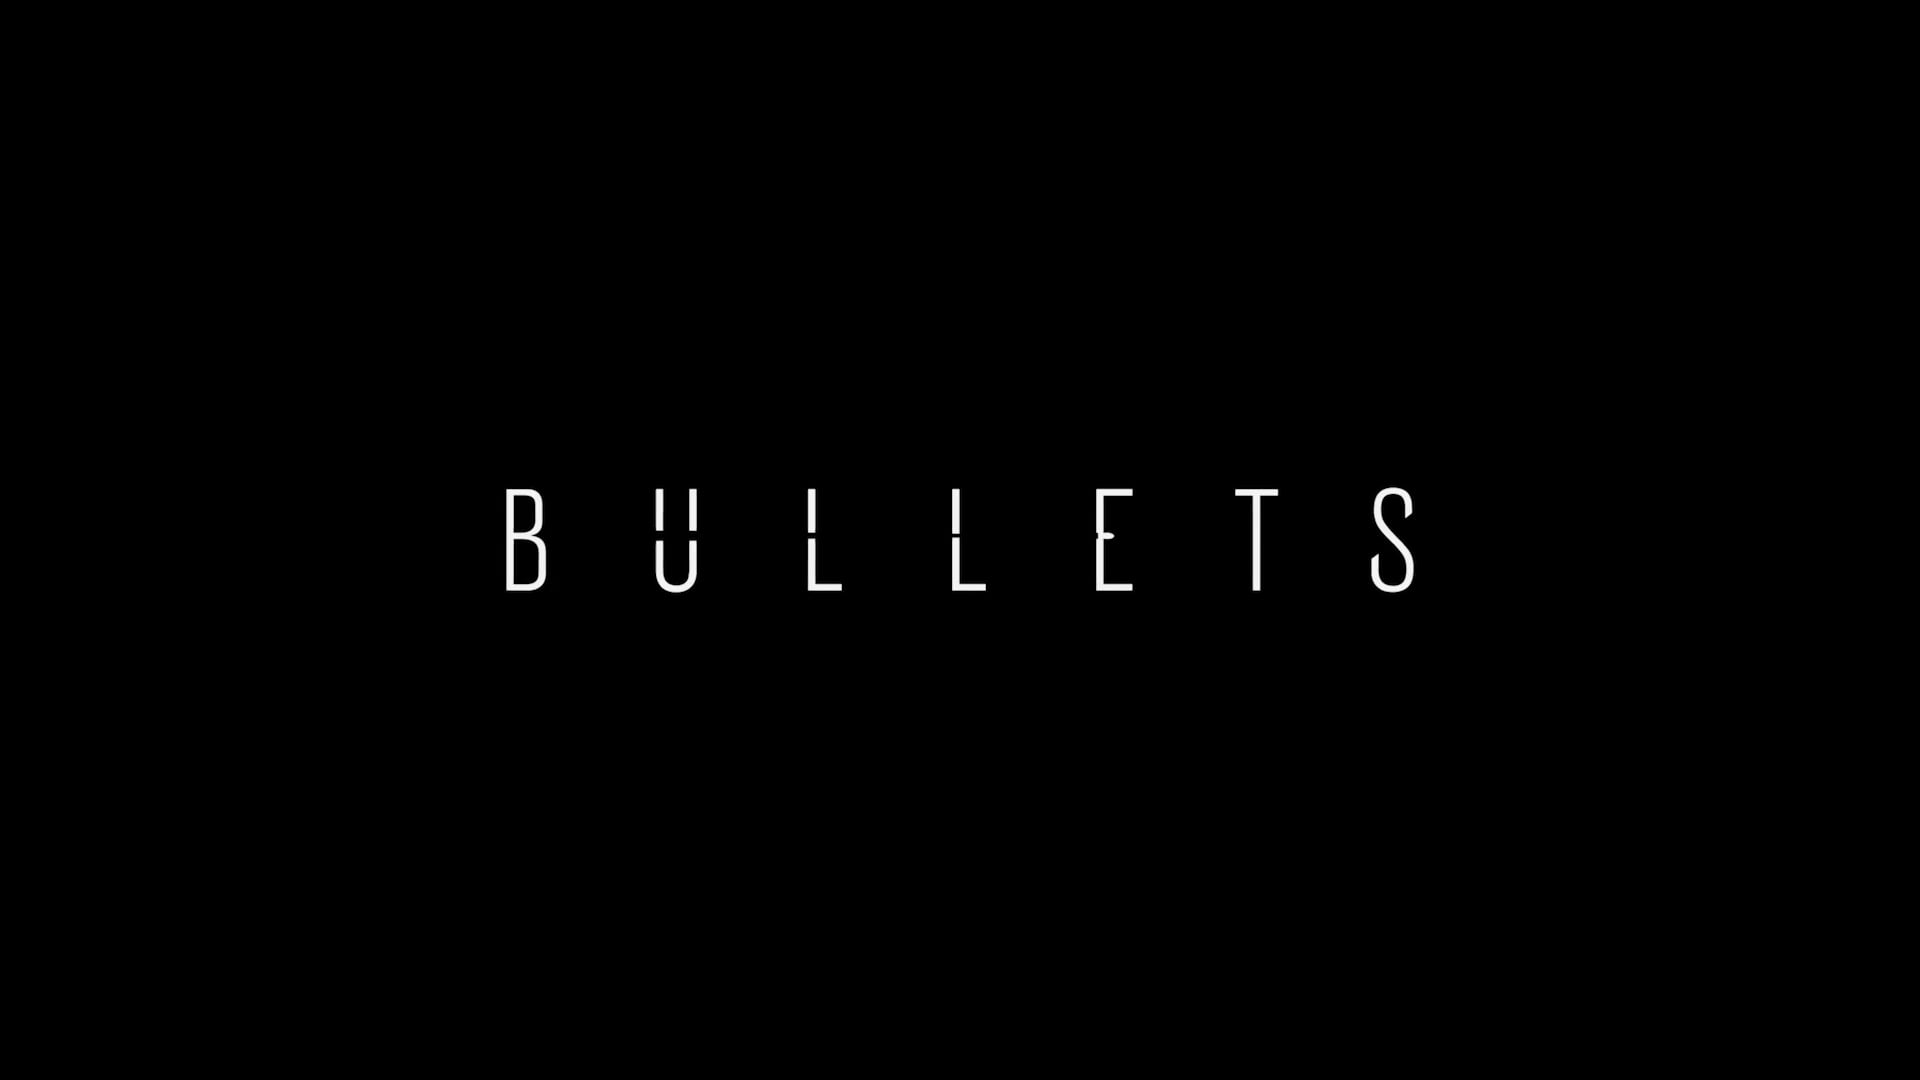 BULLETS - International Trailer